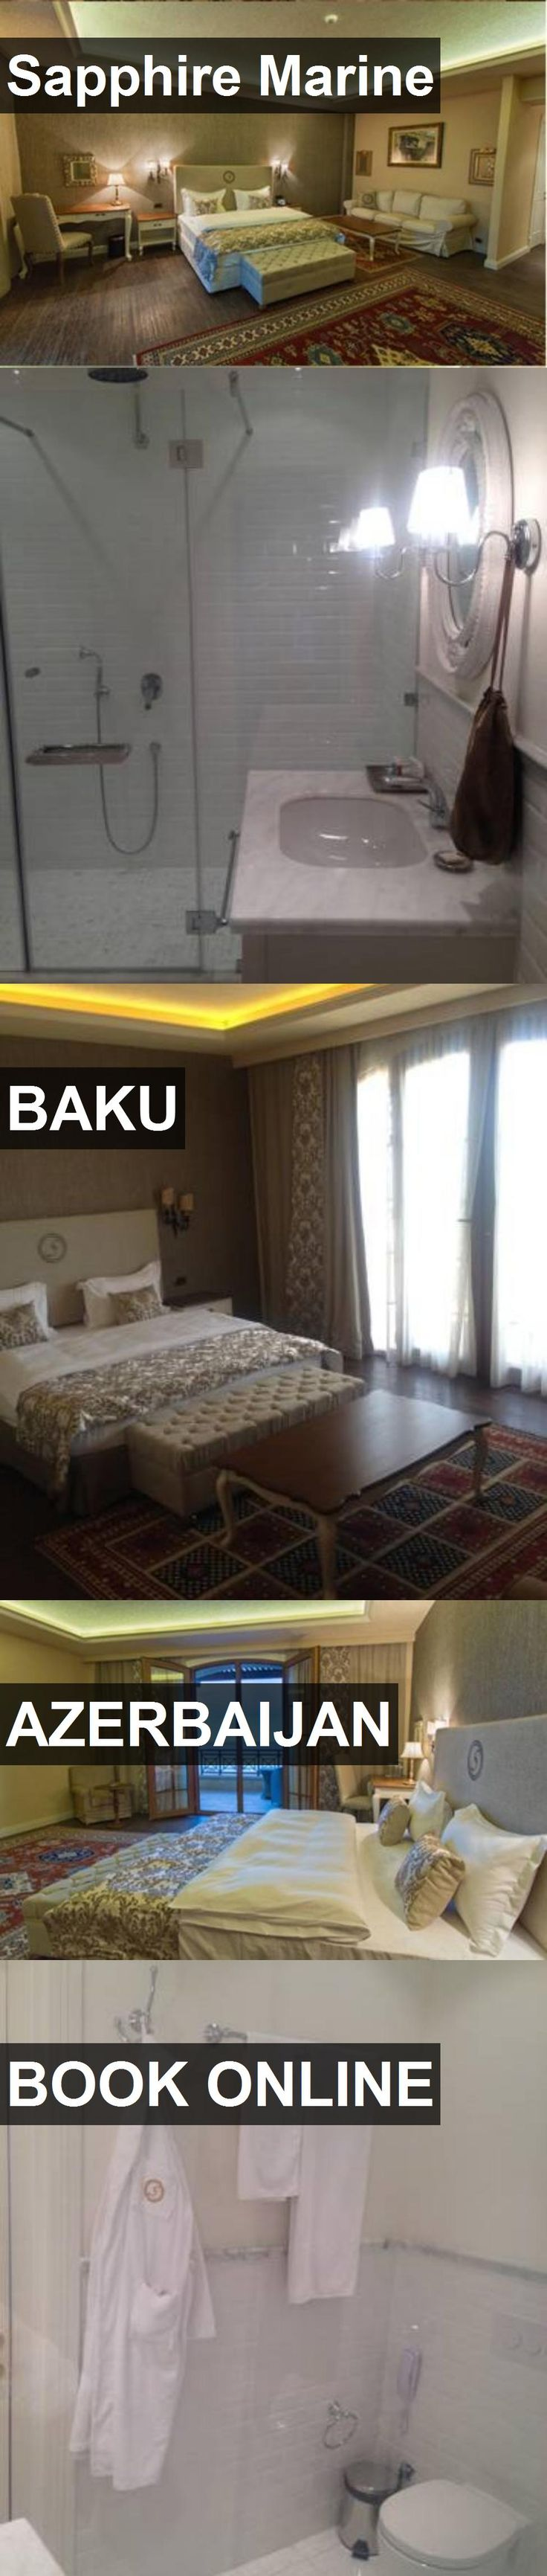 Hotel Sapphire Marine in Baku, Azerbaijan. For more information, photos, reviews and best prices please follow the link. #Azerbaijan #Baku #travel #vacation #hotel